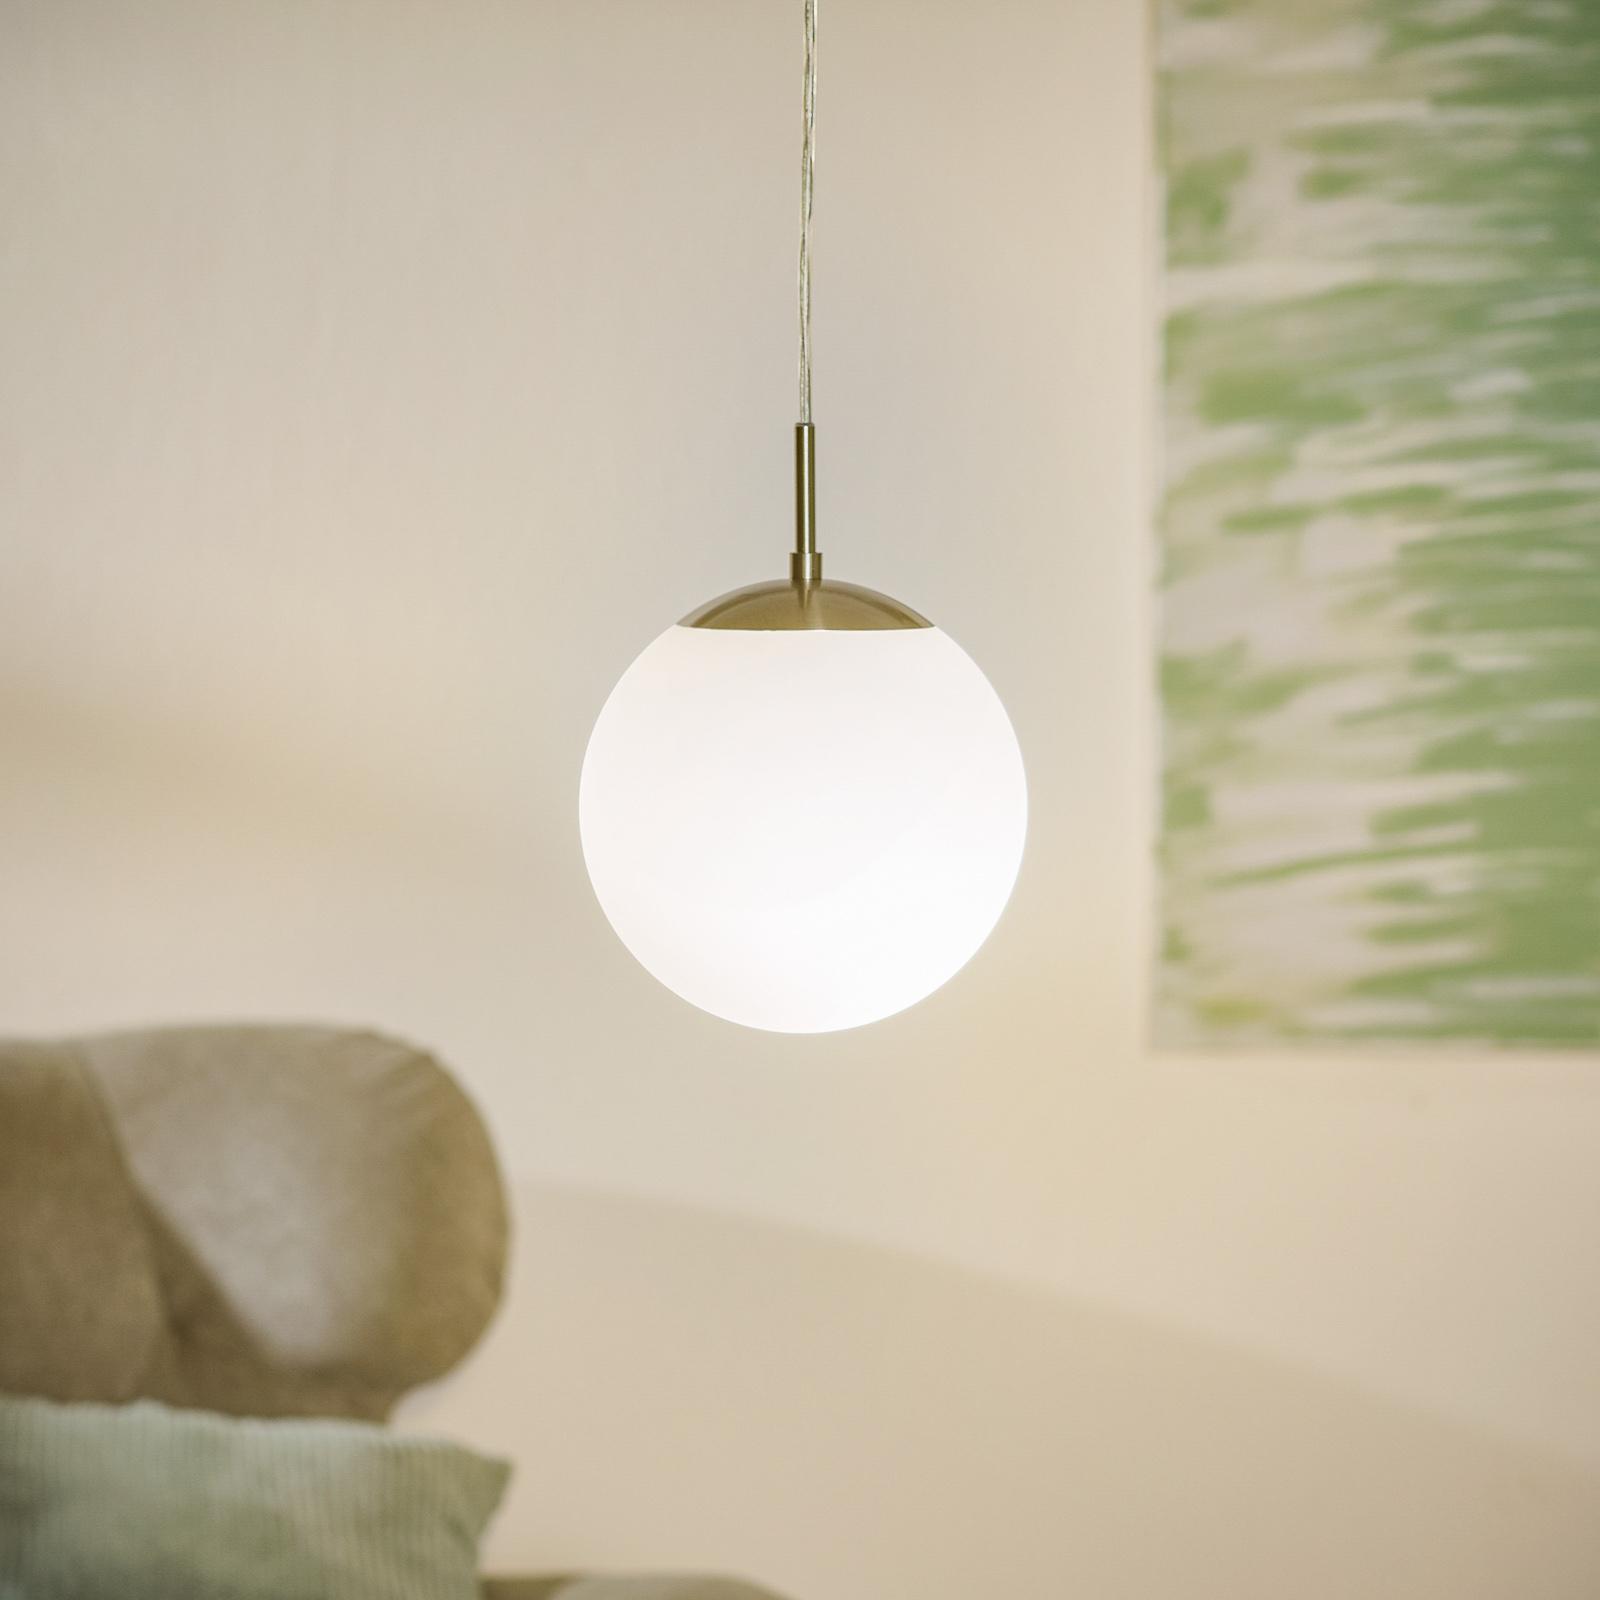 Elegante lámpara colgante Rondo de 20 cm